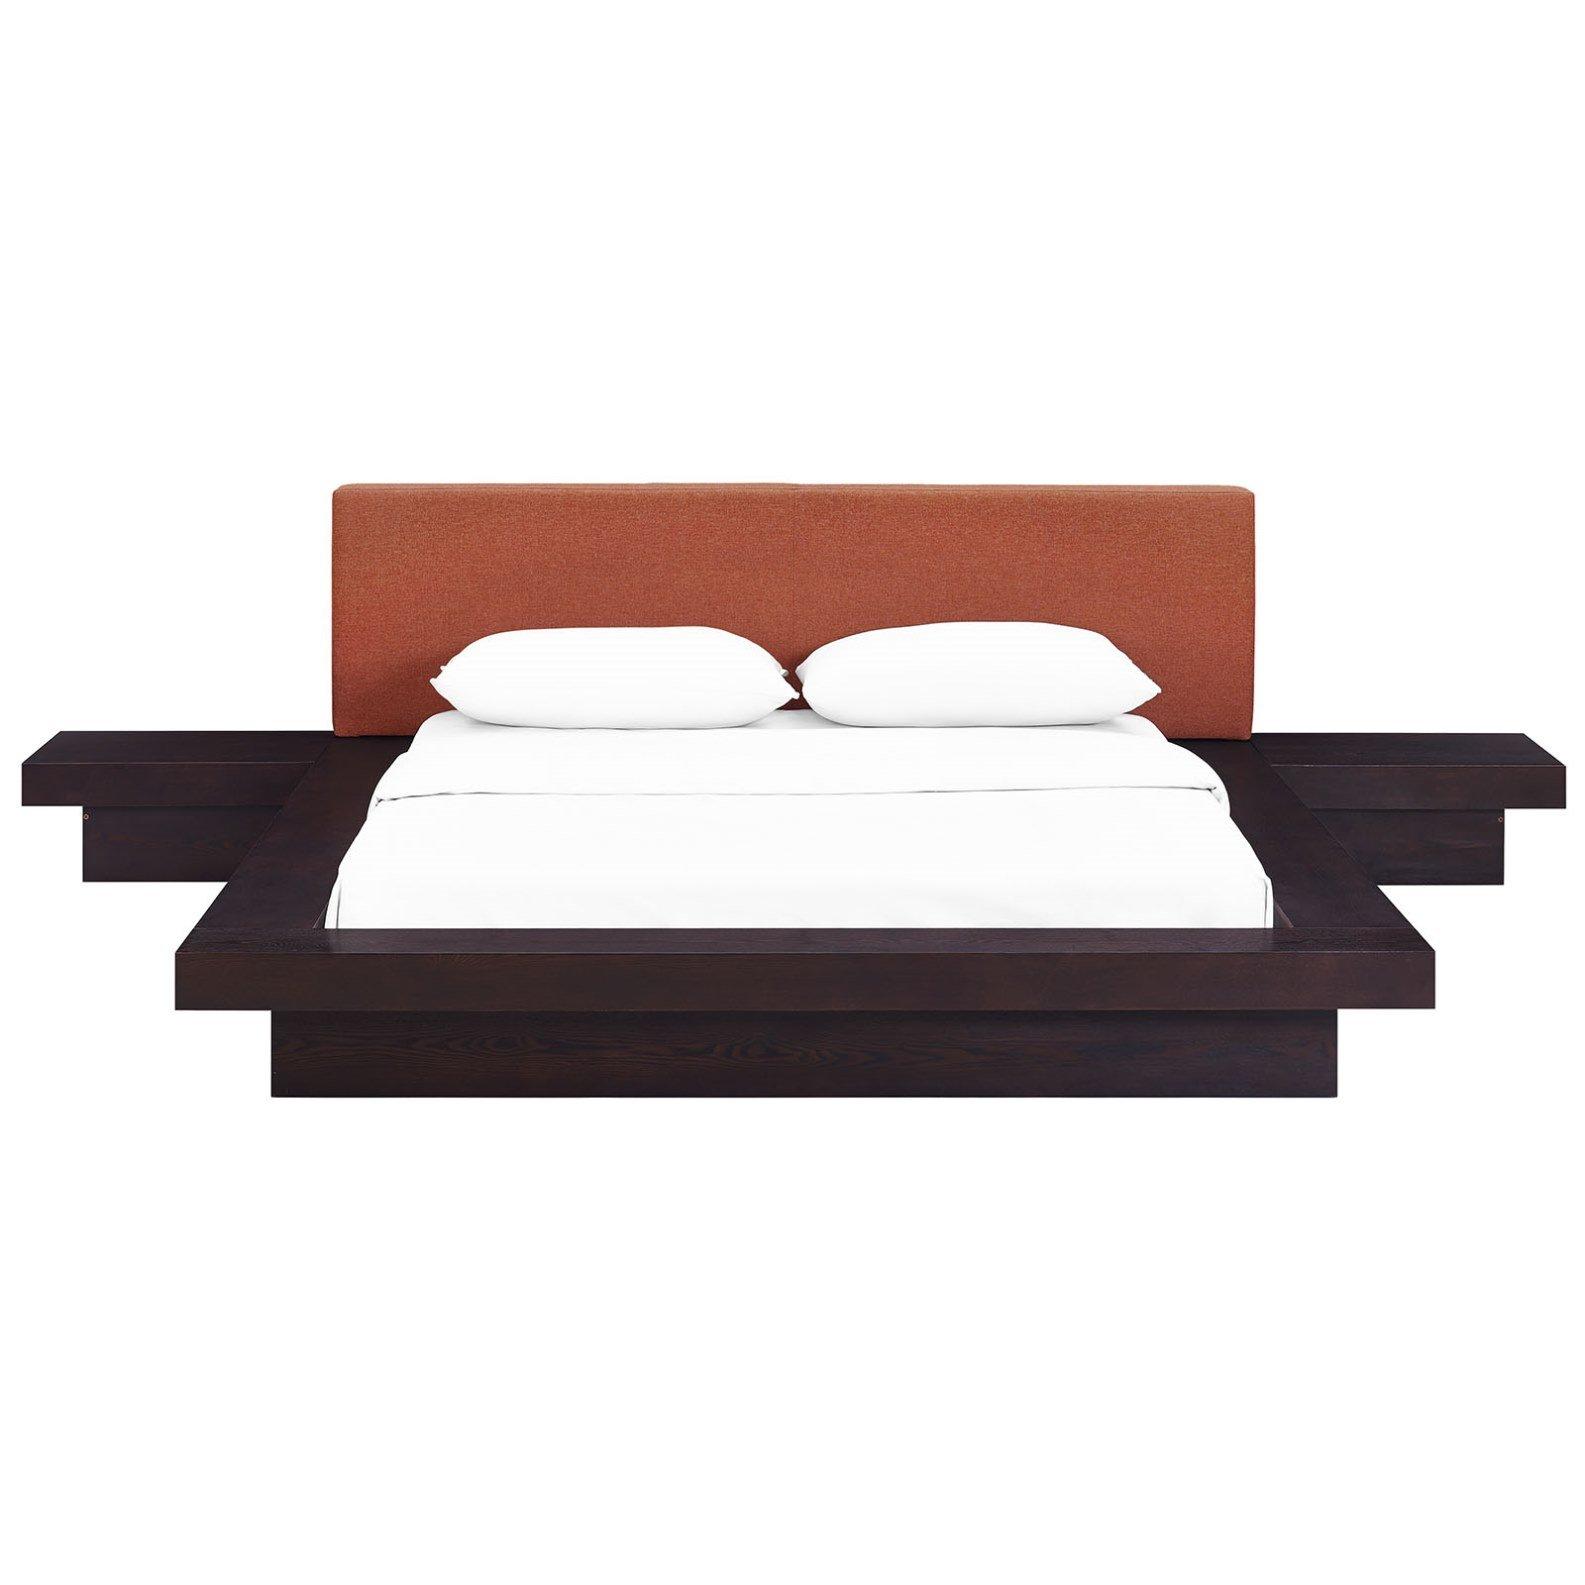 Modern Contemporary Urban Design Three PCS Queen Size Bedroom Bed Set, Orange, Fabric Wood